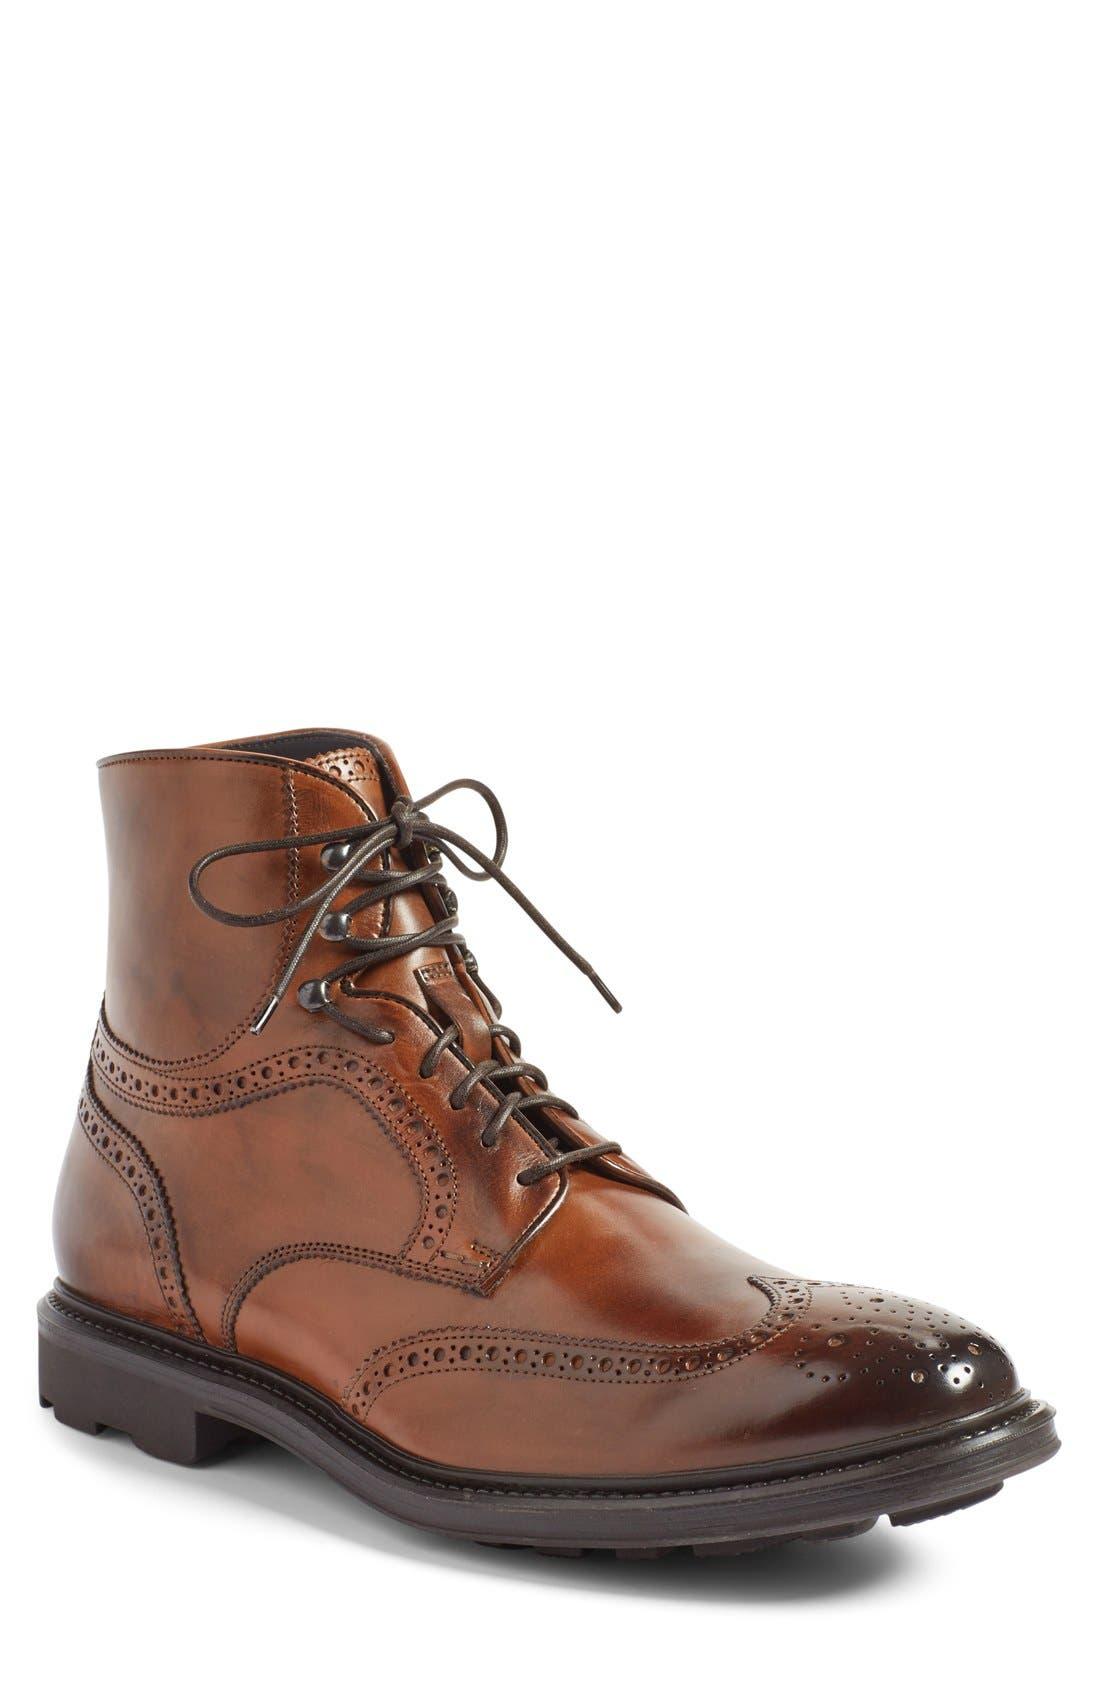 Alternate Image 1 Selected - To Boot New York 'Hobson' Wingtip Boot (Men)